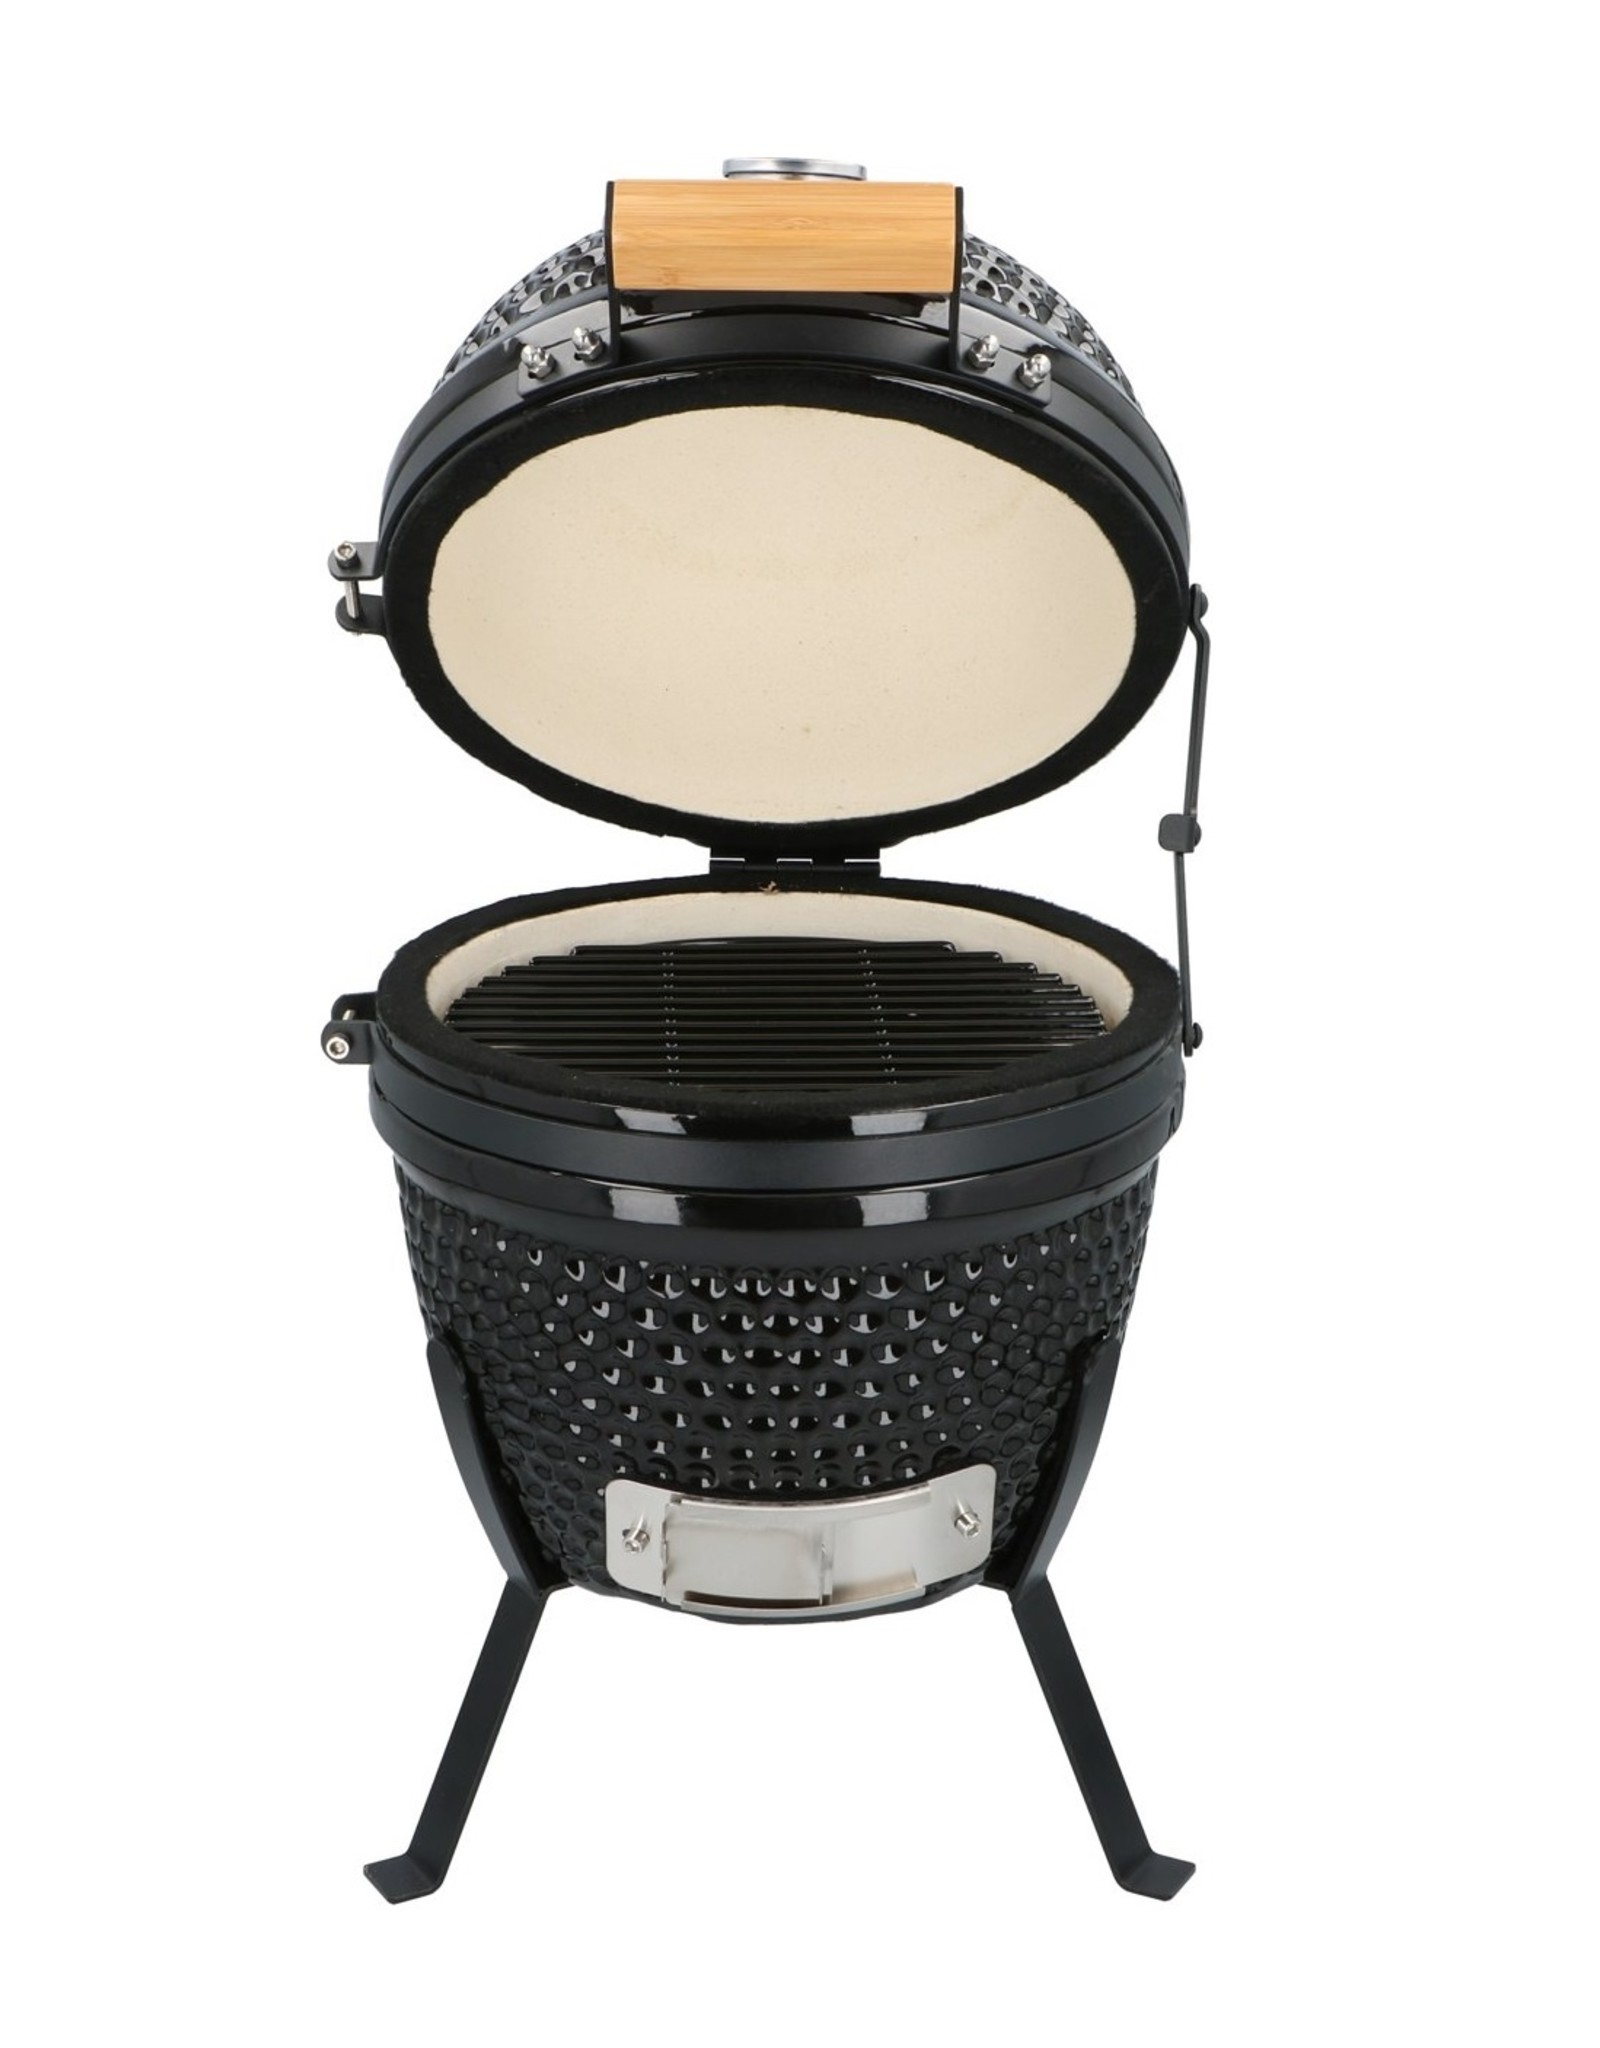 Barbecue EI-model - houtskoolbarbecue - Diameter 25 cm